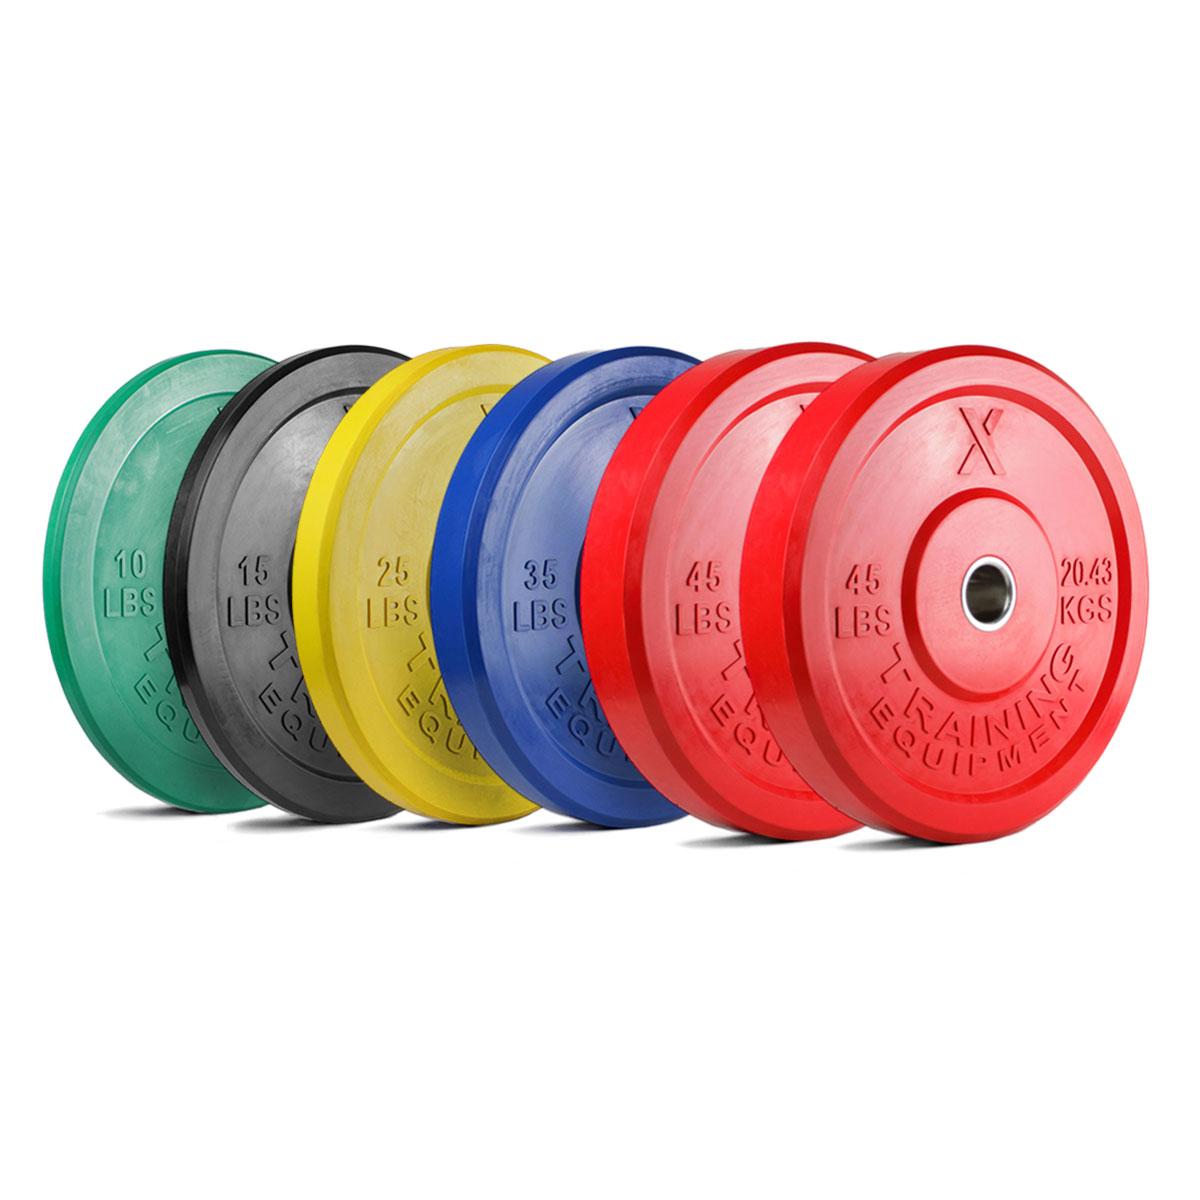 Premium Color Bumper Plates and Sets